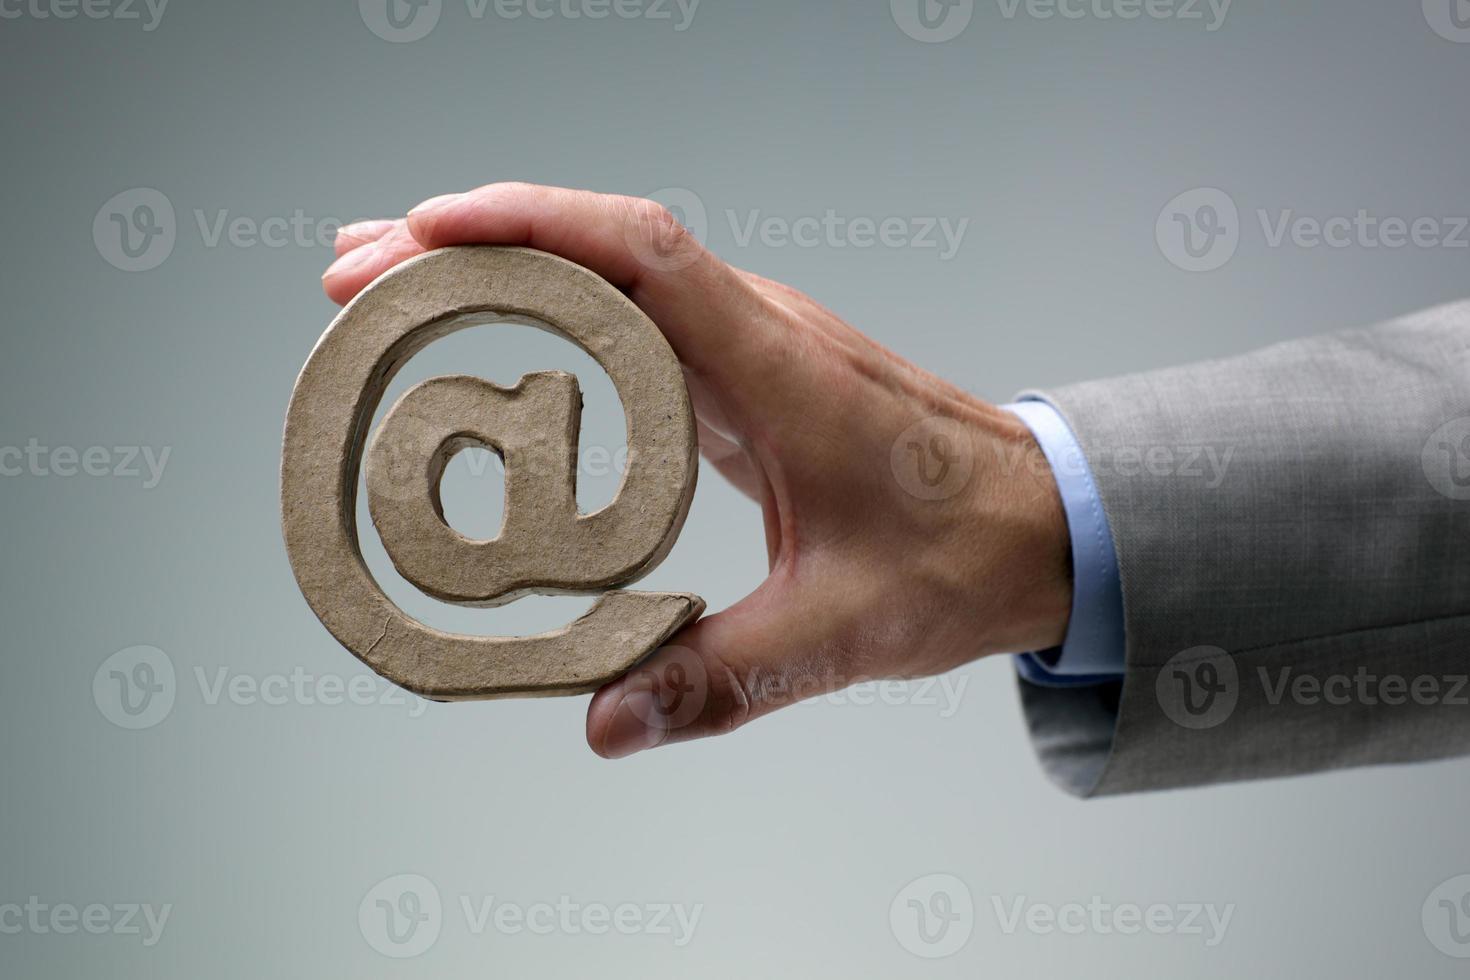 simbolo e-mail @ foto